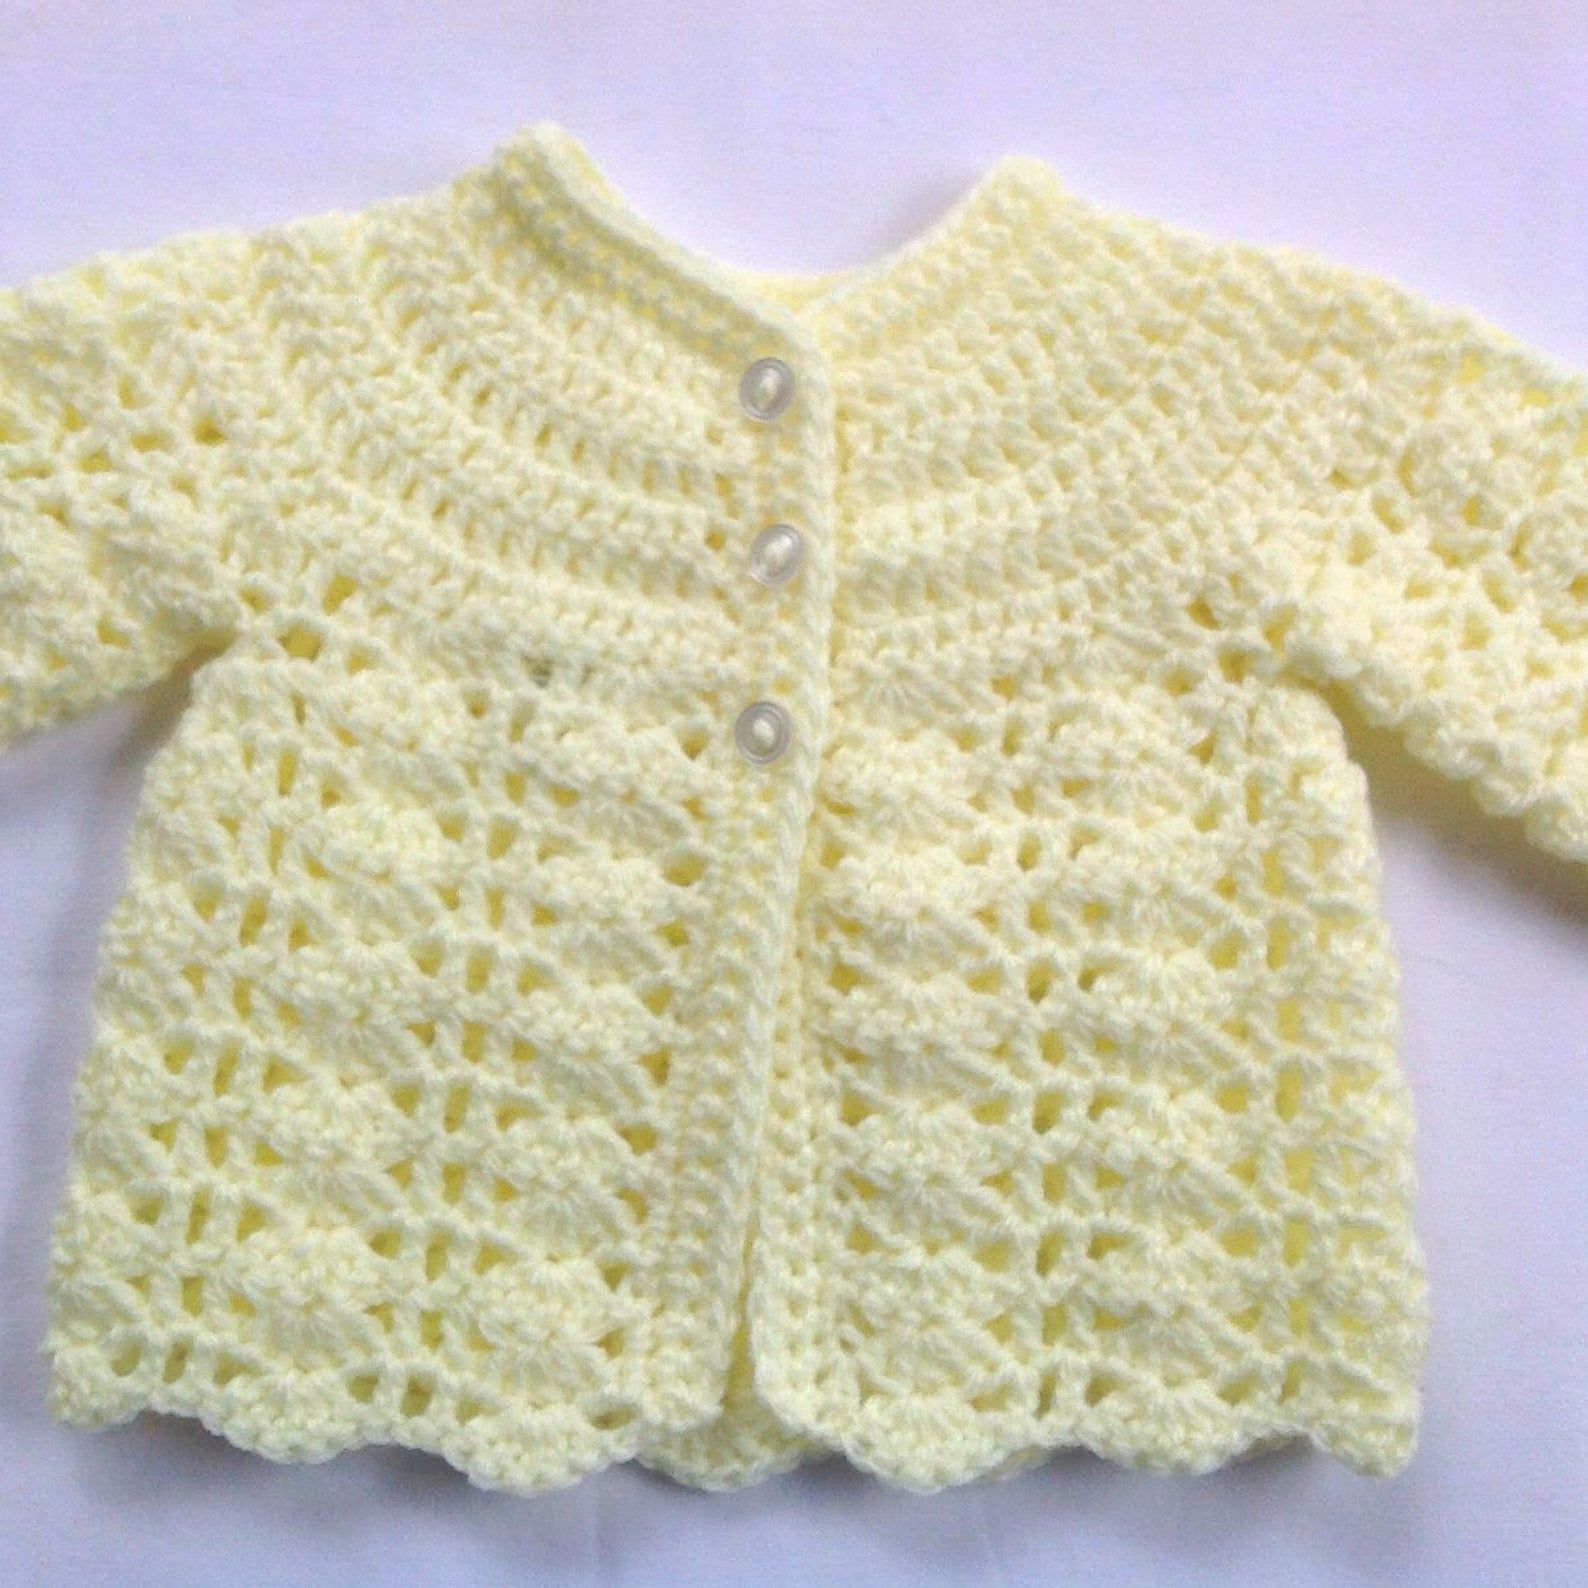 Newborn baby coat and booties set - Yellow baby cr